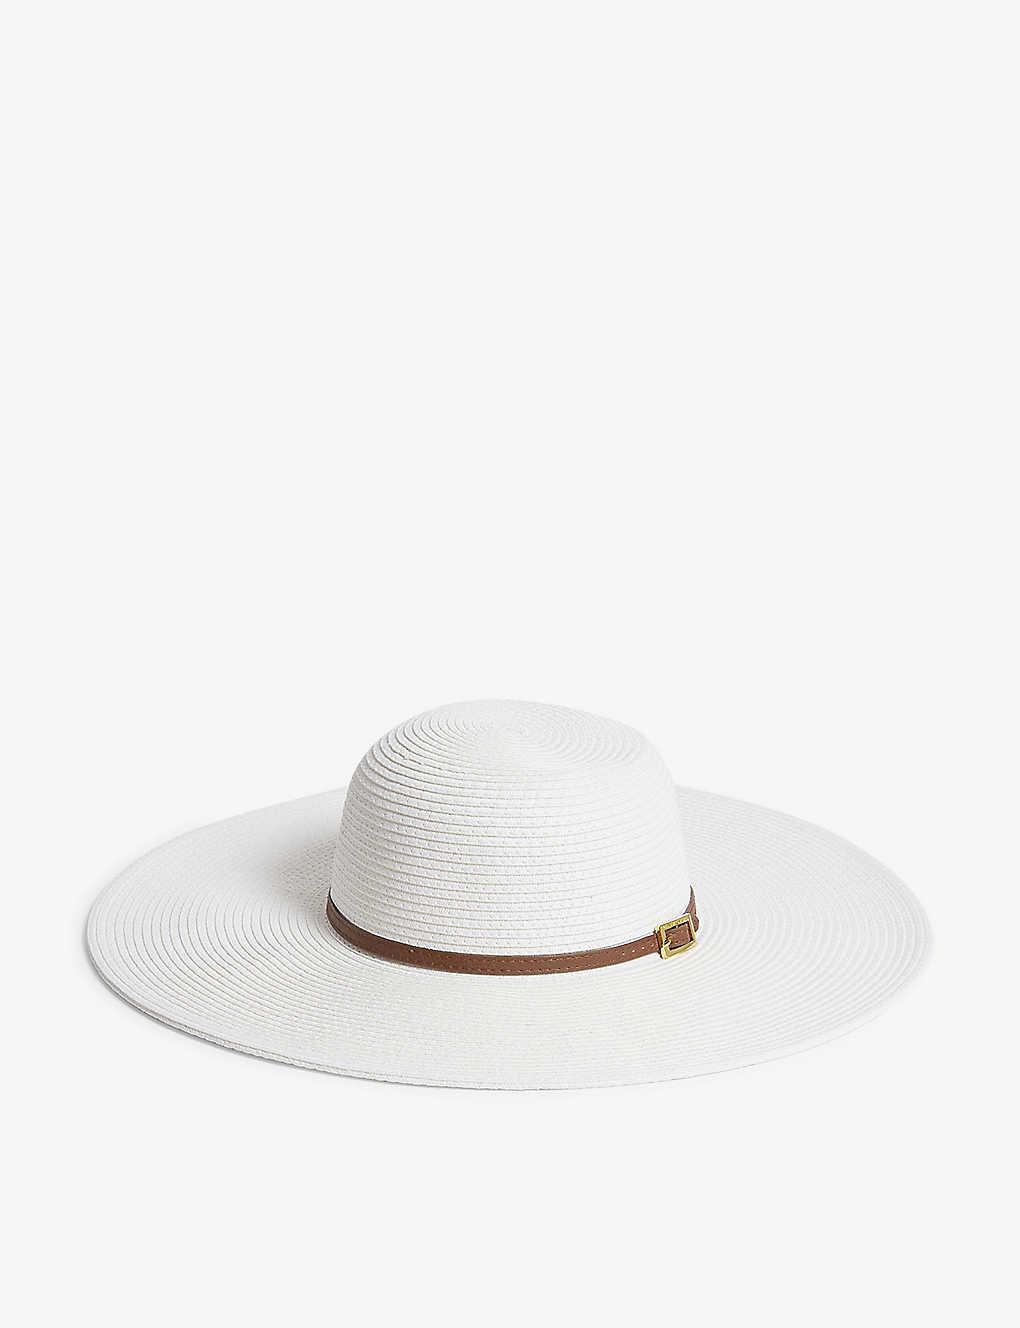 MELISSA ODABASH - Jemina belt-trim woven hat  2c00e6e77db4